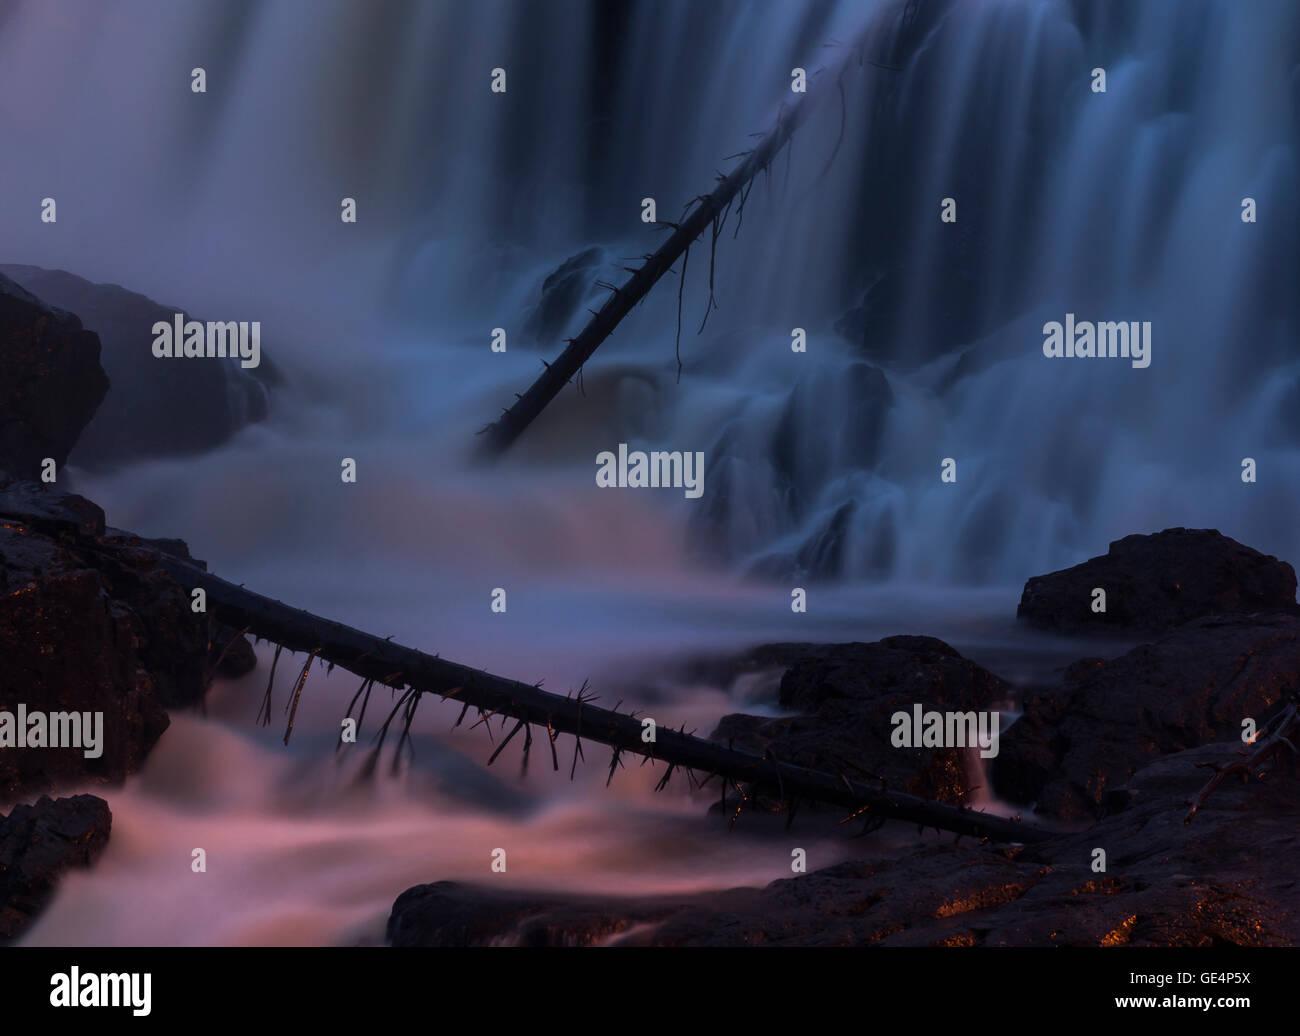 The Haugfossen, waterfall, at Blaafarveværket in  Åmot, Modum, Norway. Taken at night. Stock Photo